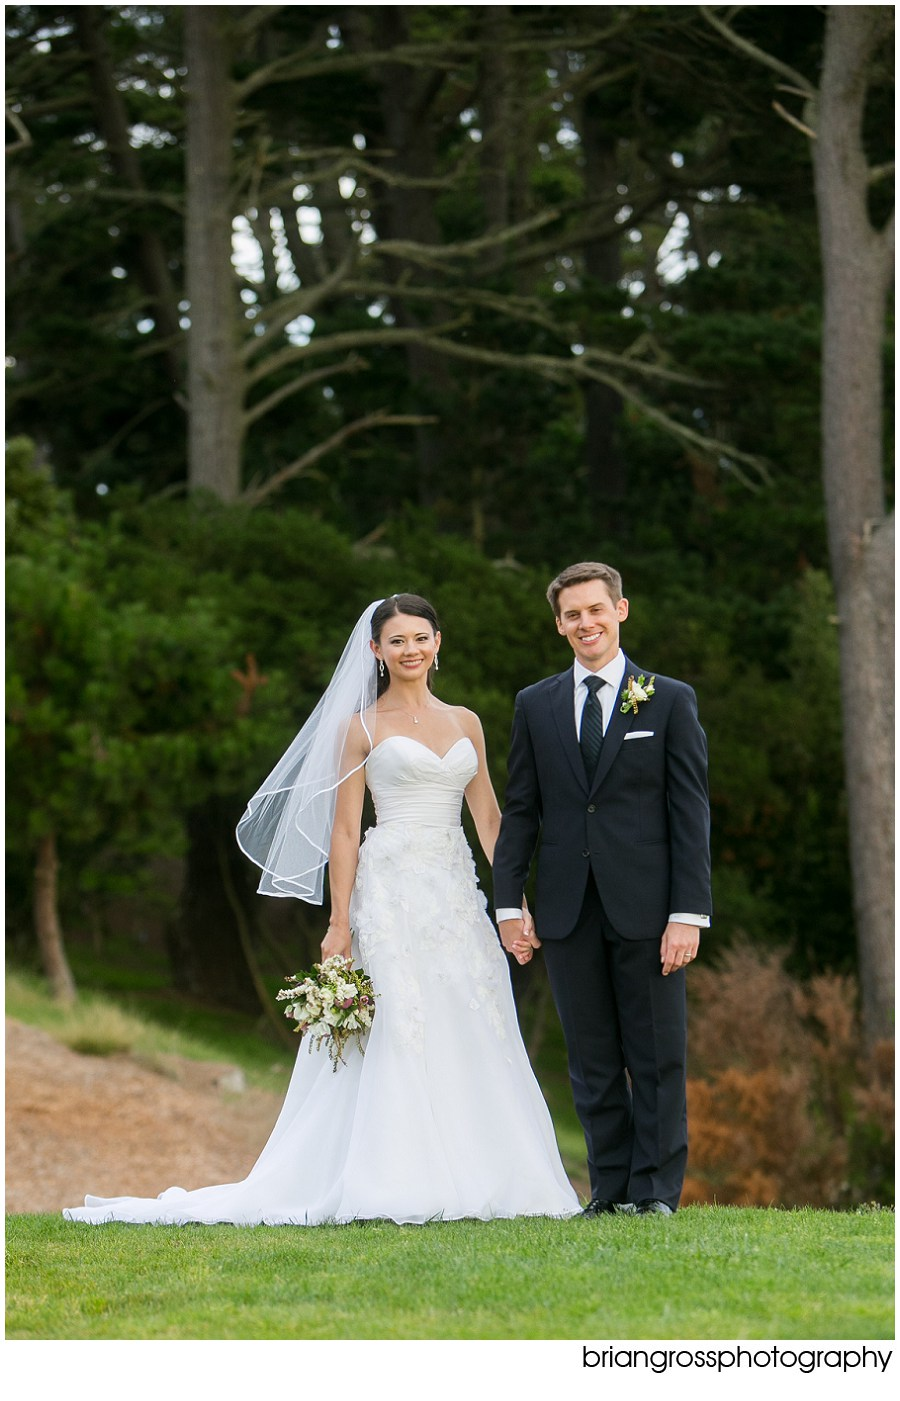 BlakeAndSarah_Wedding_BrianGrossPhotography-217